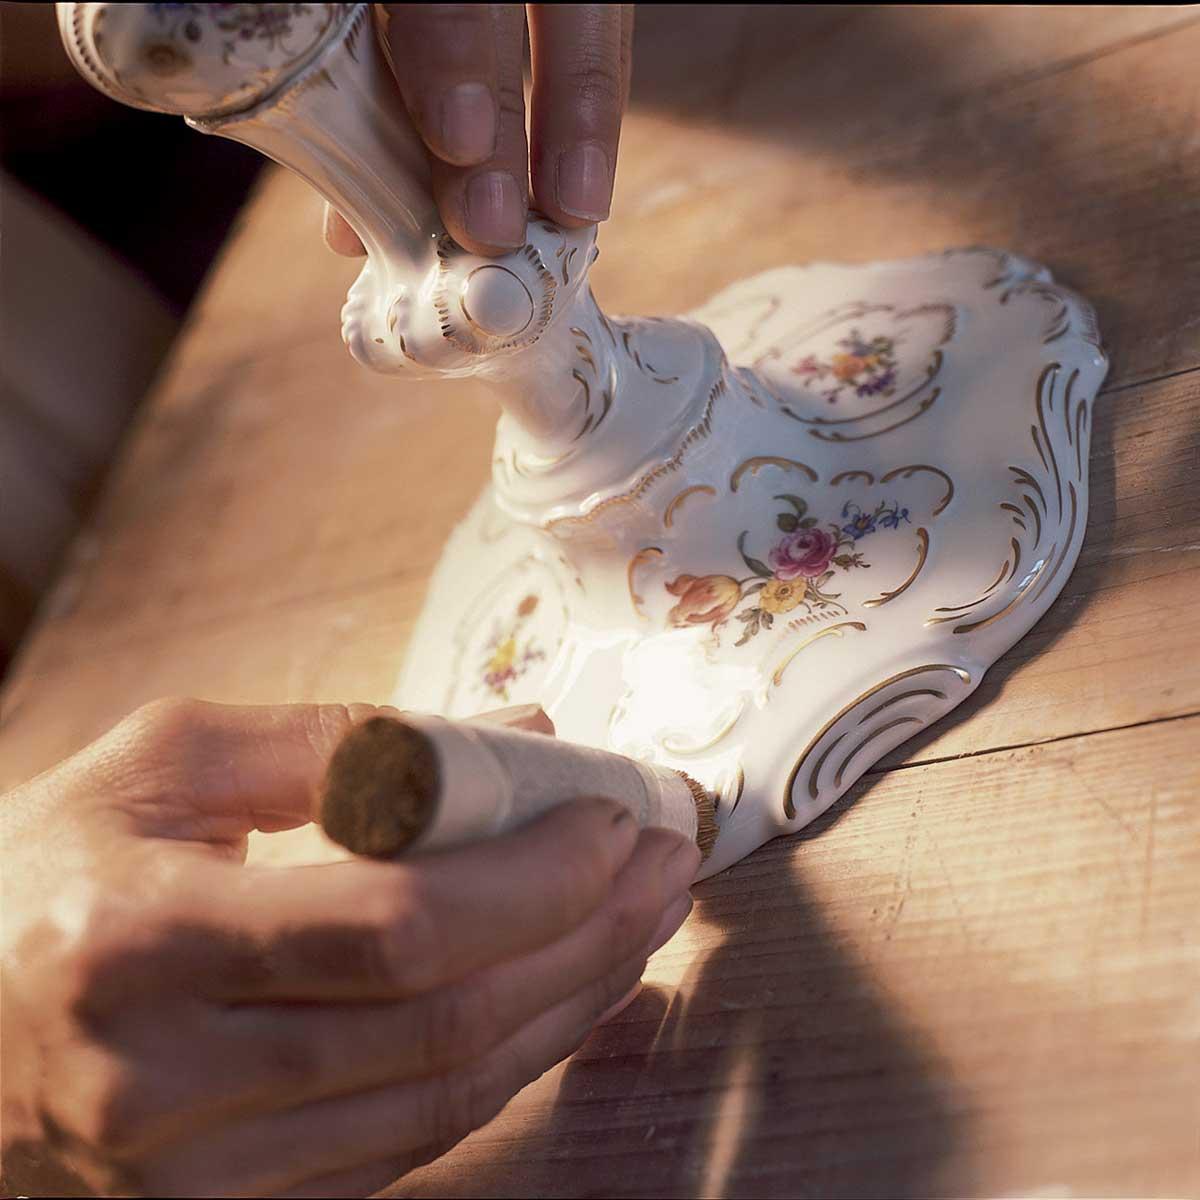 Porzellanmanufaktur Ludwigsburg: Polieren; Foto: Porzellanmanufaktur Ludwigsburg GmbH